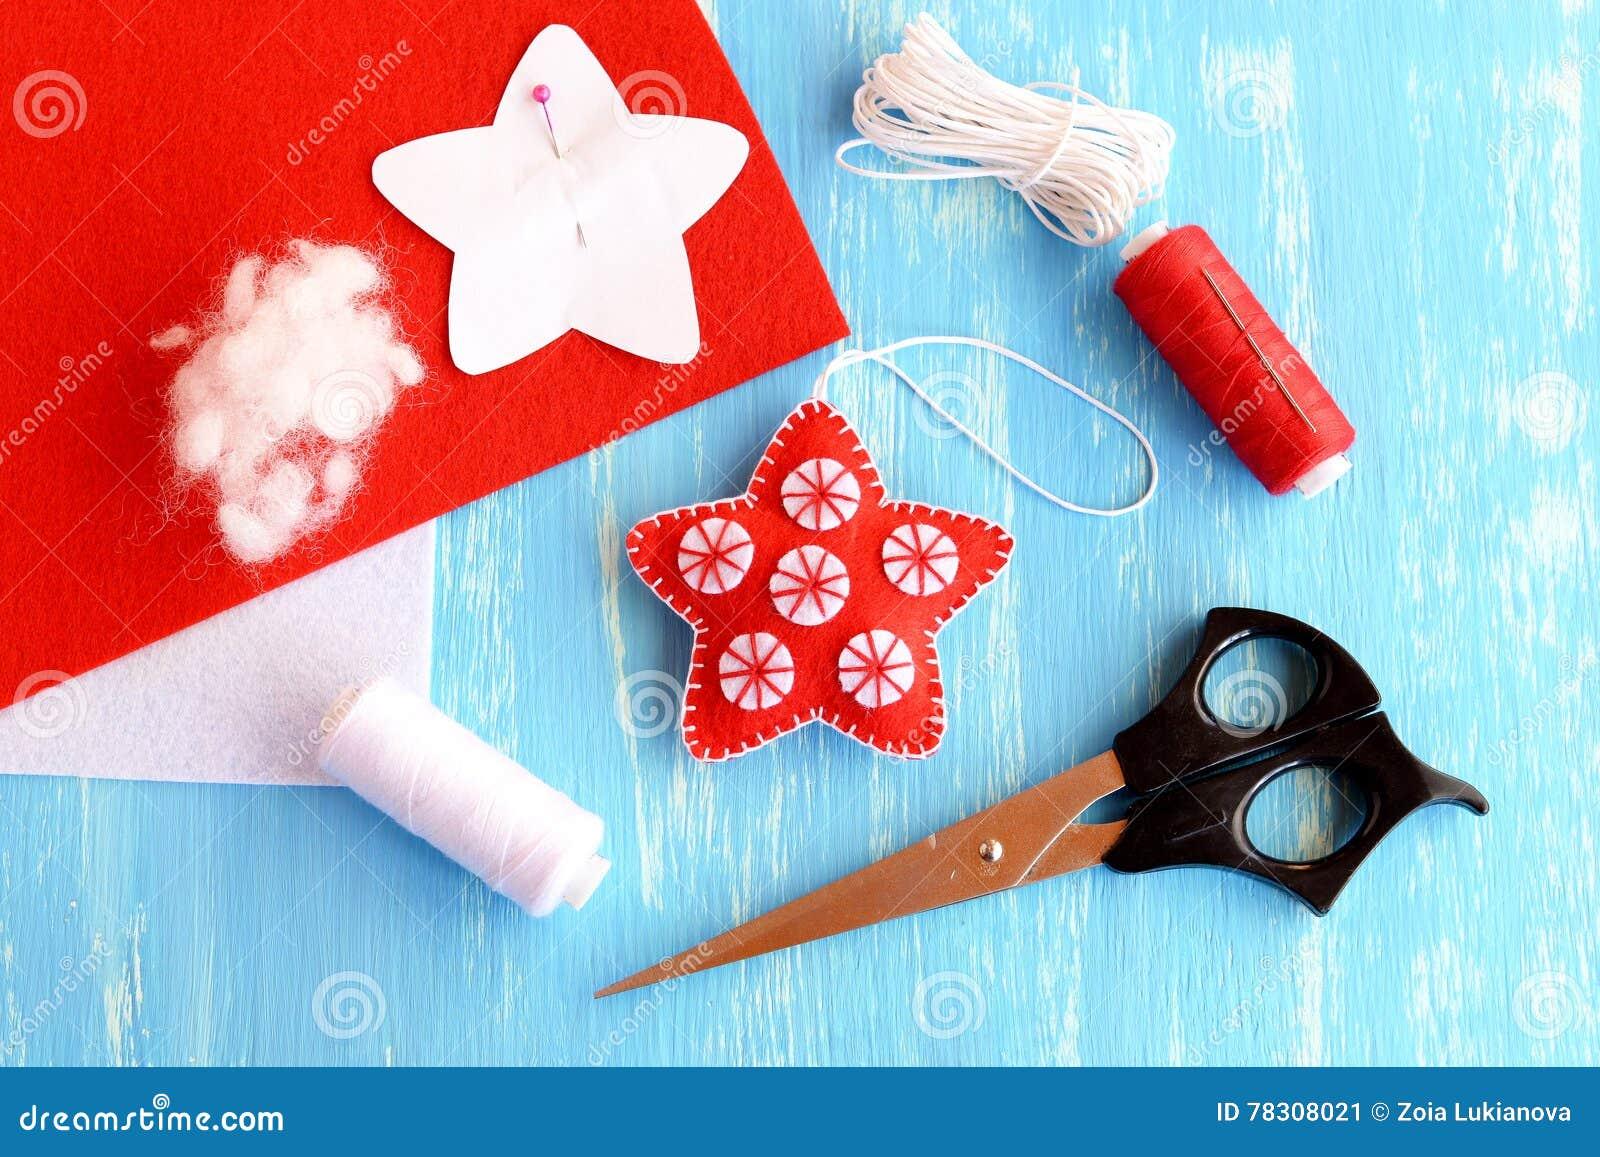 Felt Christmas Star Diy, Paper Pattern Pinned To Red Felt Sheet ...